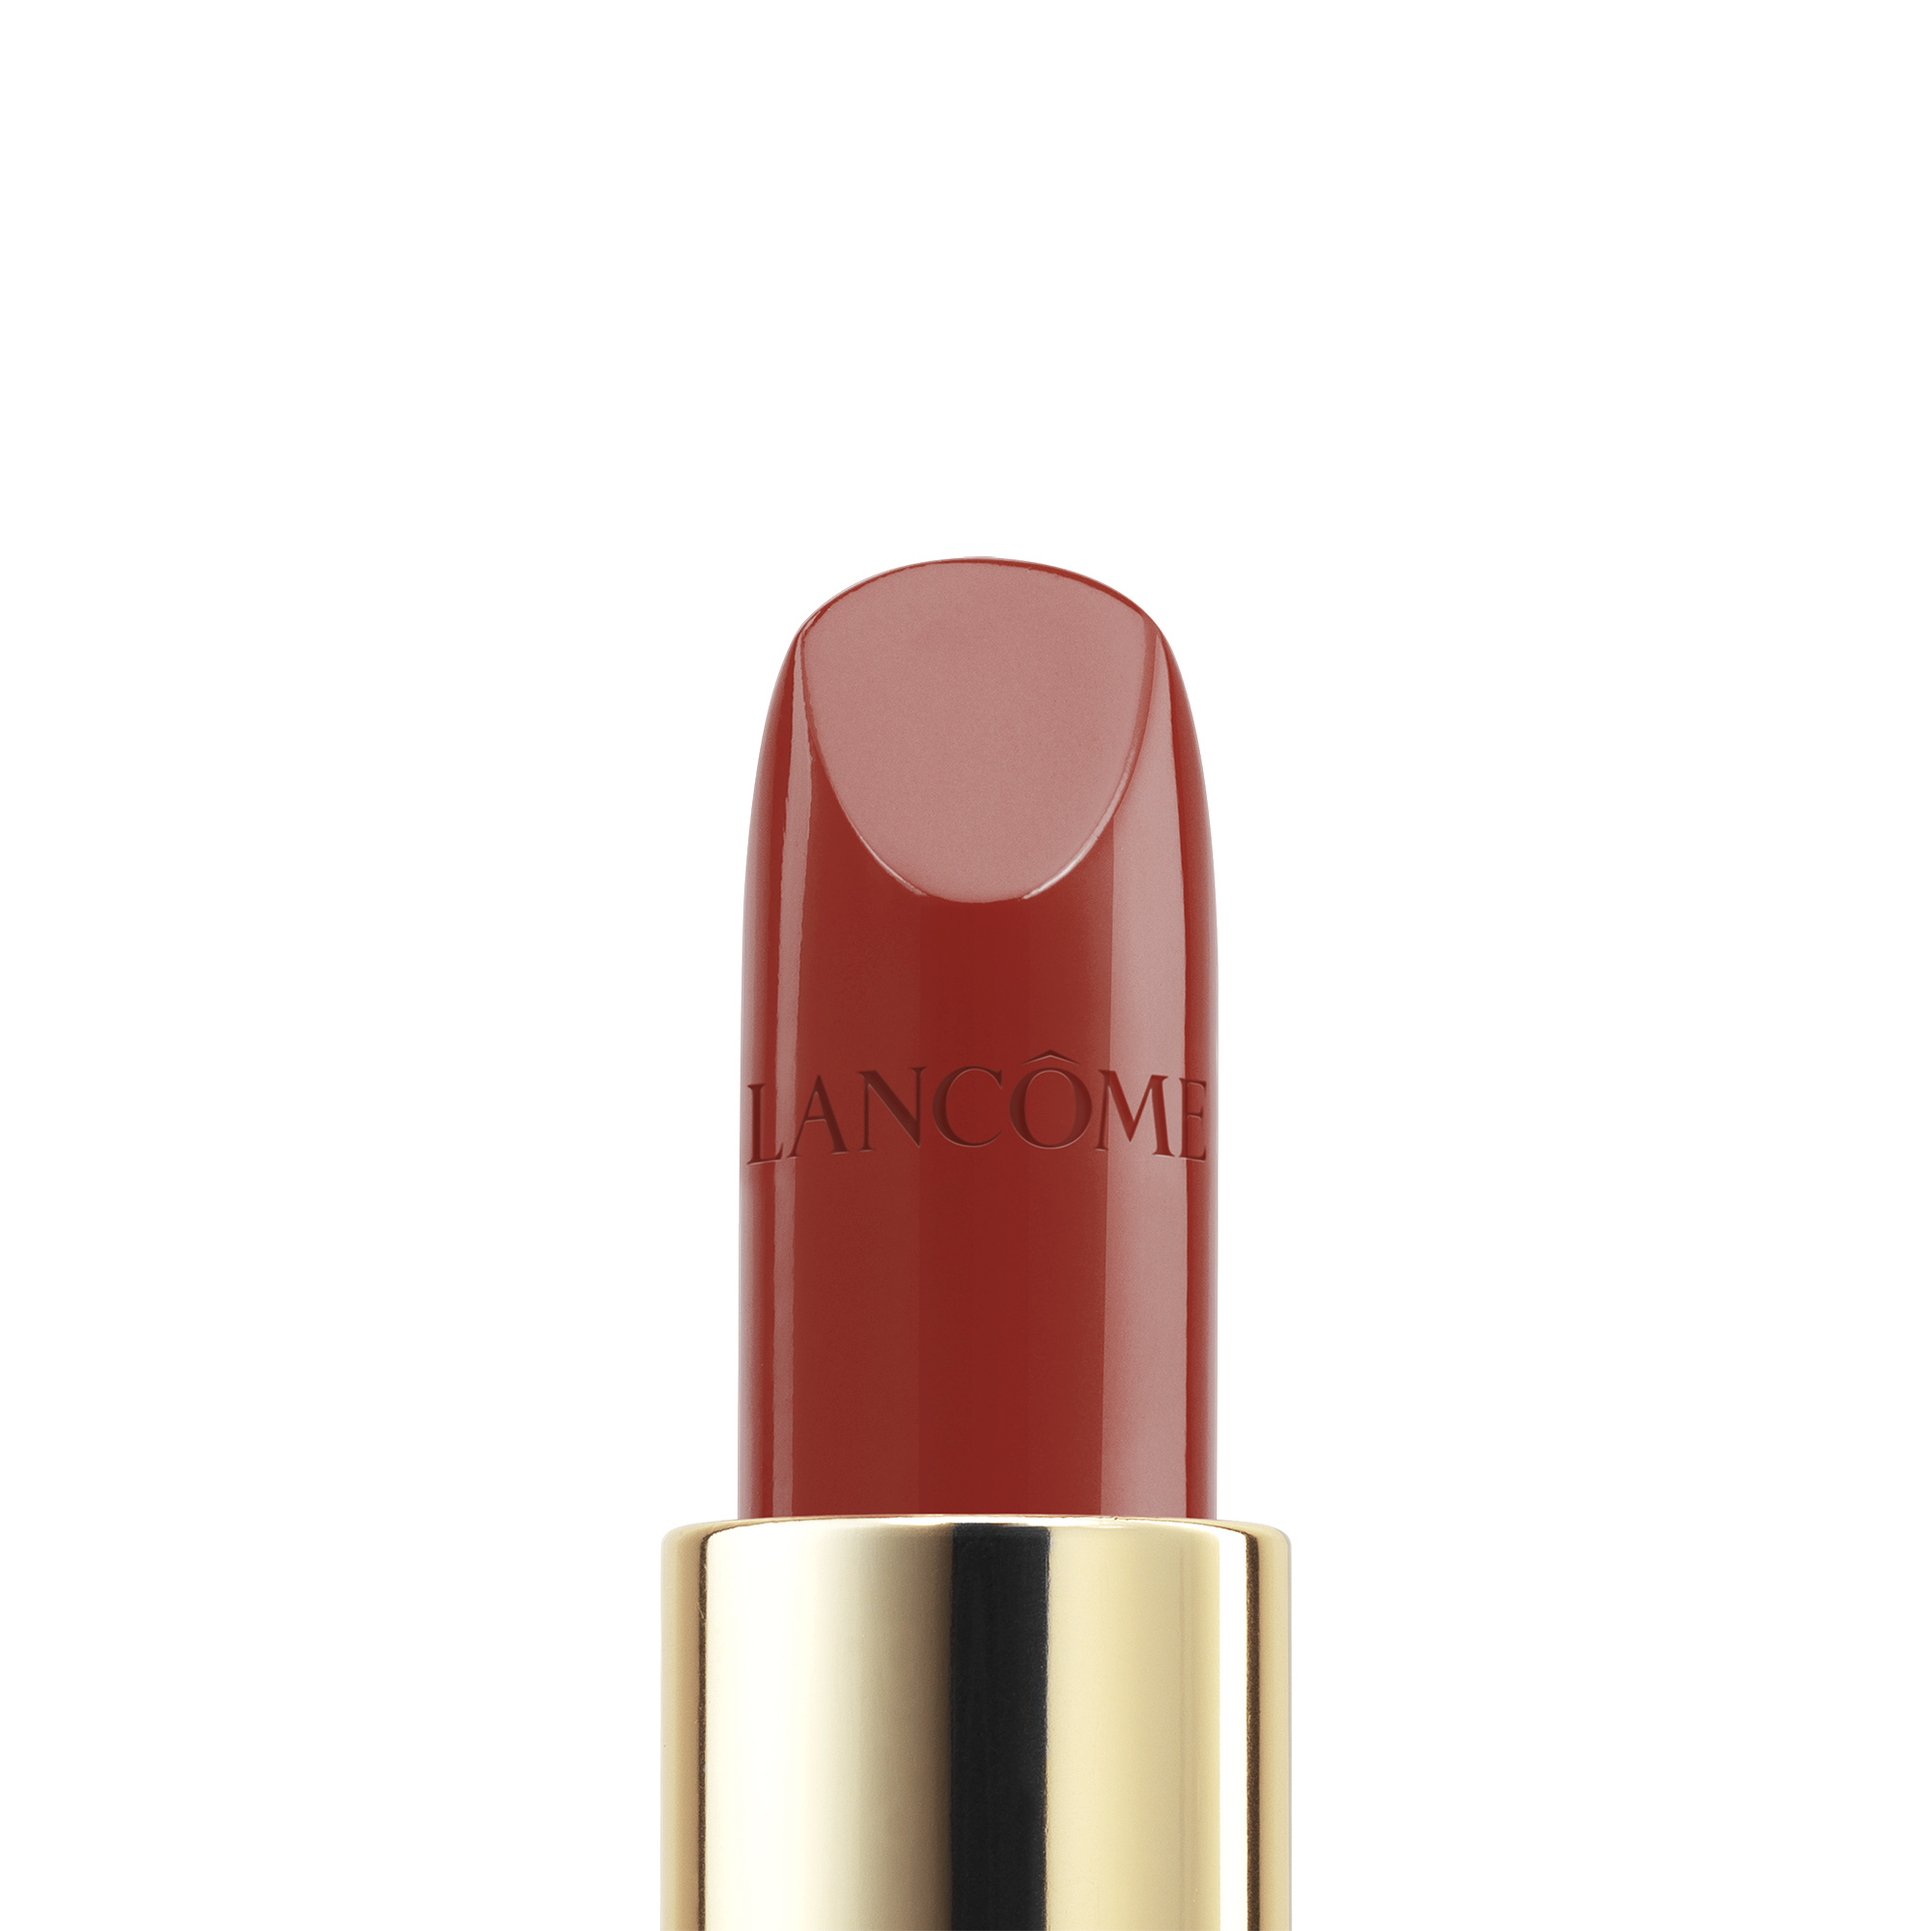 Lancôme Absolu Rouge Cream Lipstick, 196